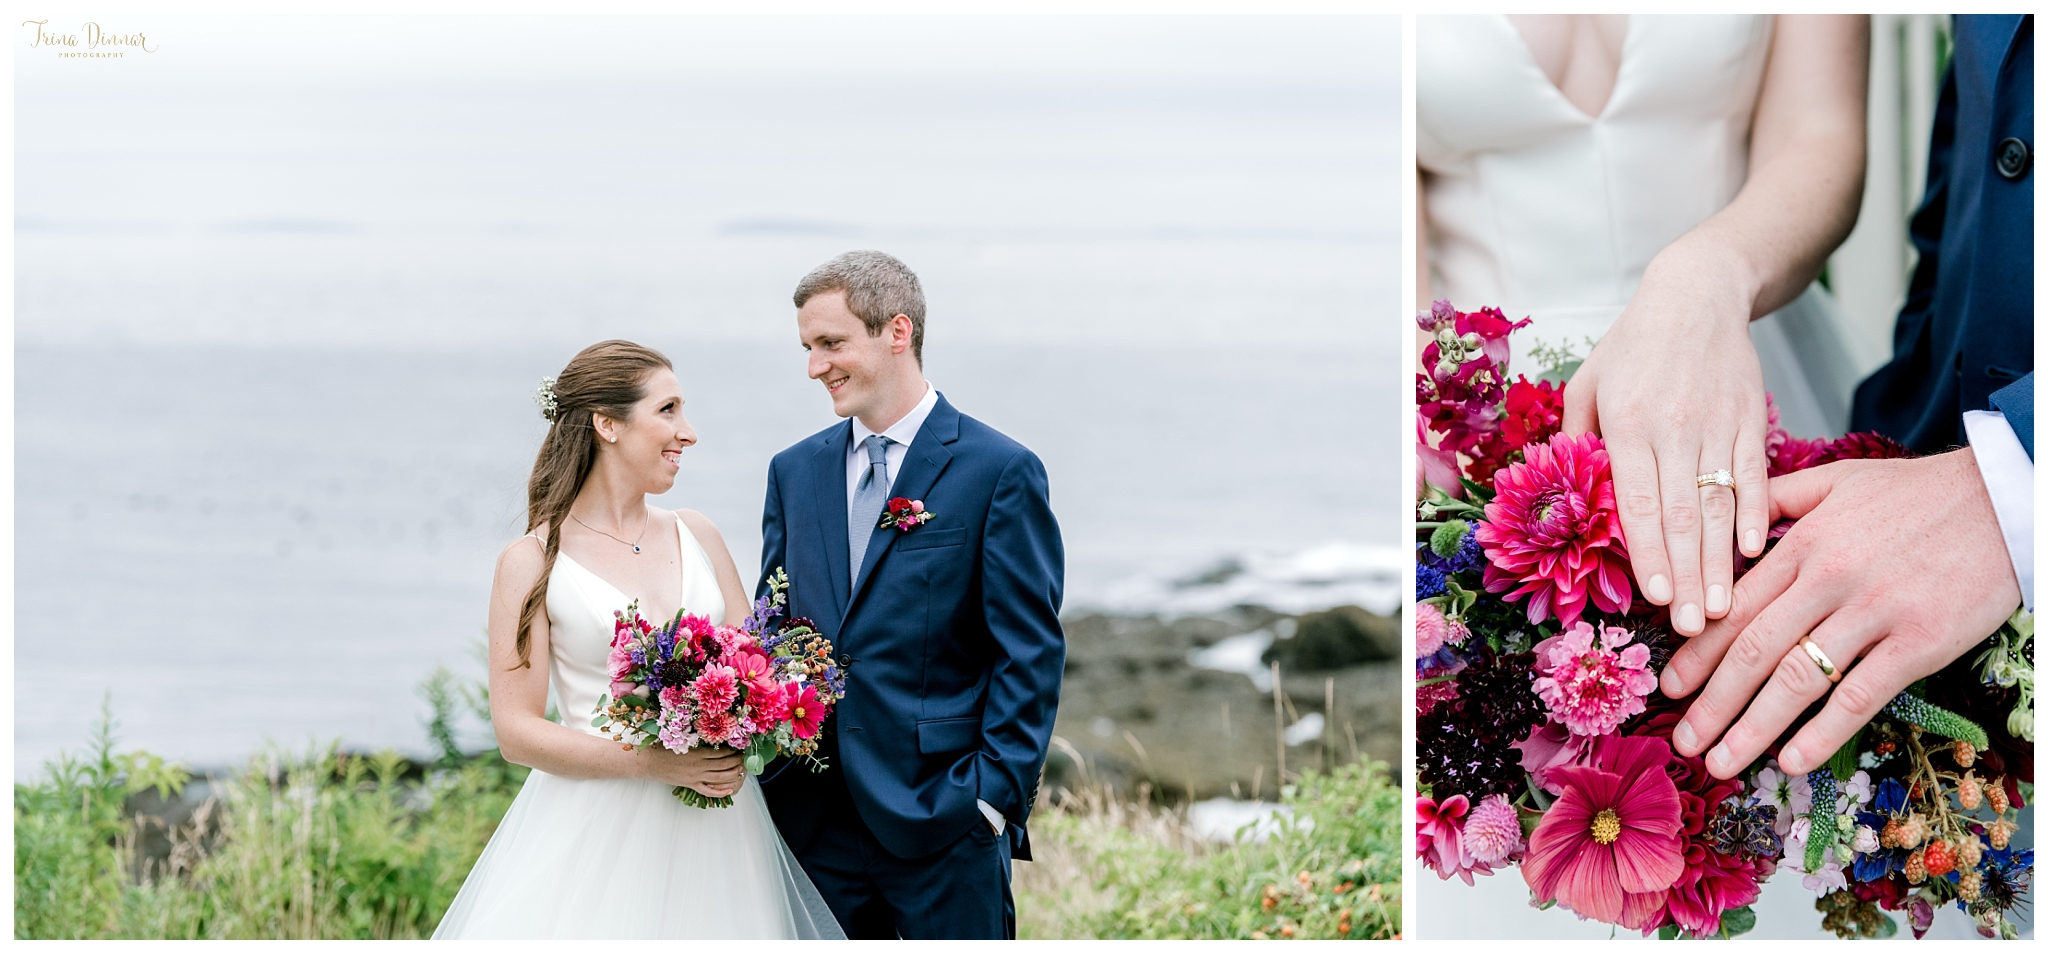 Coastal Maine Bride and Groom Wedding Pictures